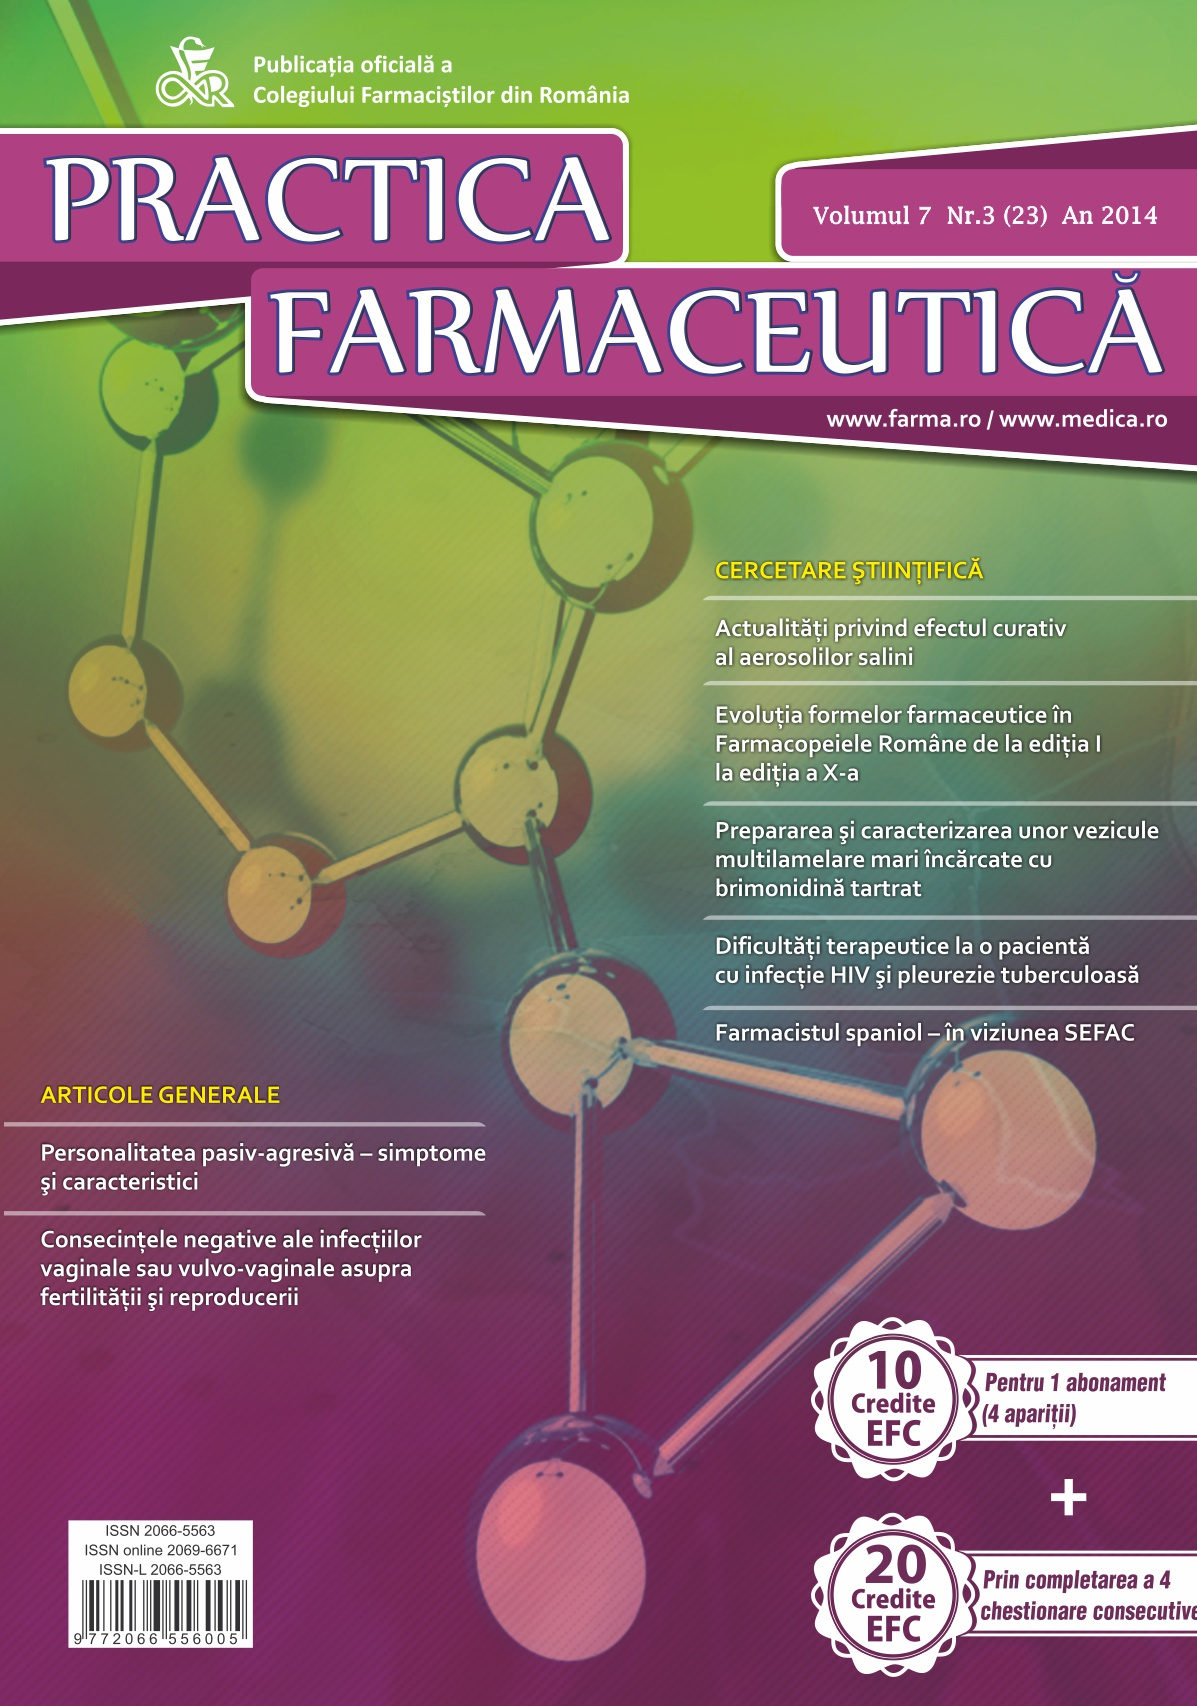 Revista Practica Farmaceutica, Vol. VII, No. 3 (23), 2014